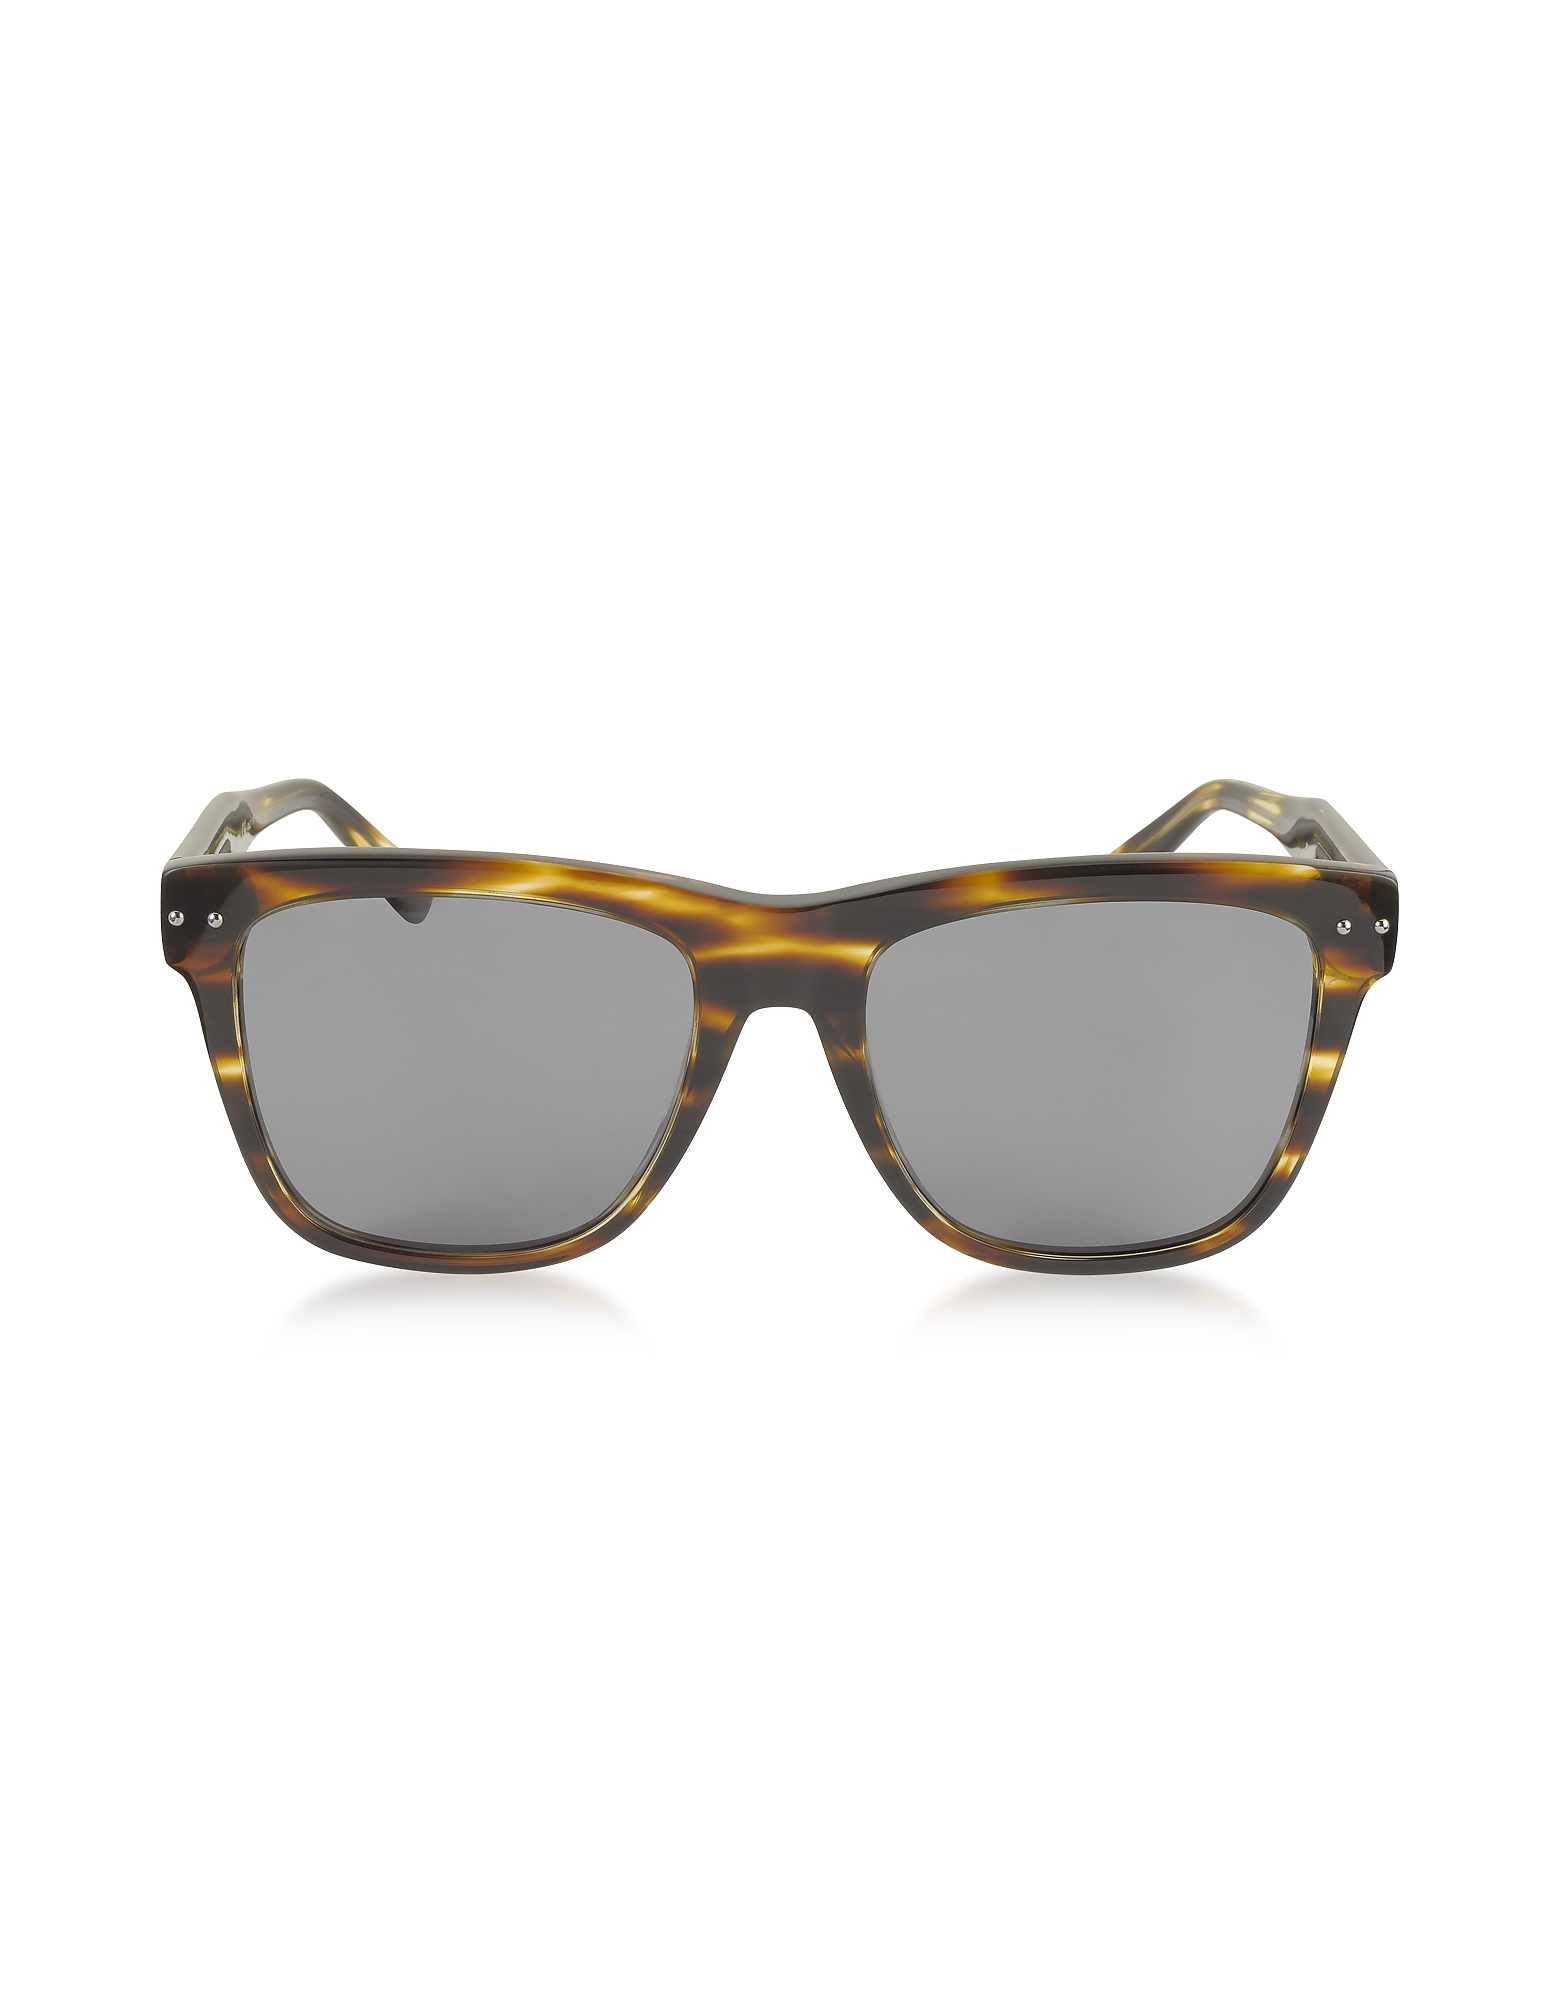 Bottega Veneta Sunglasses, BV0098S 002 Light Havana Acetate Frame Unisex Sunglasses